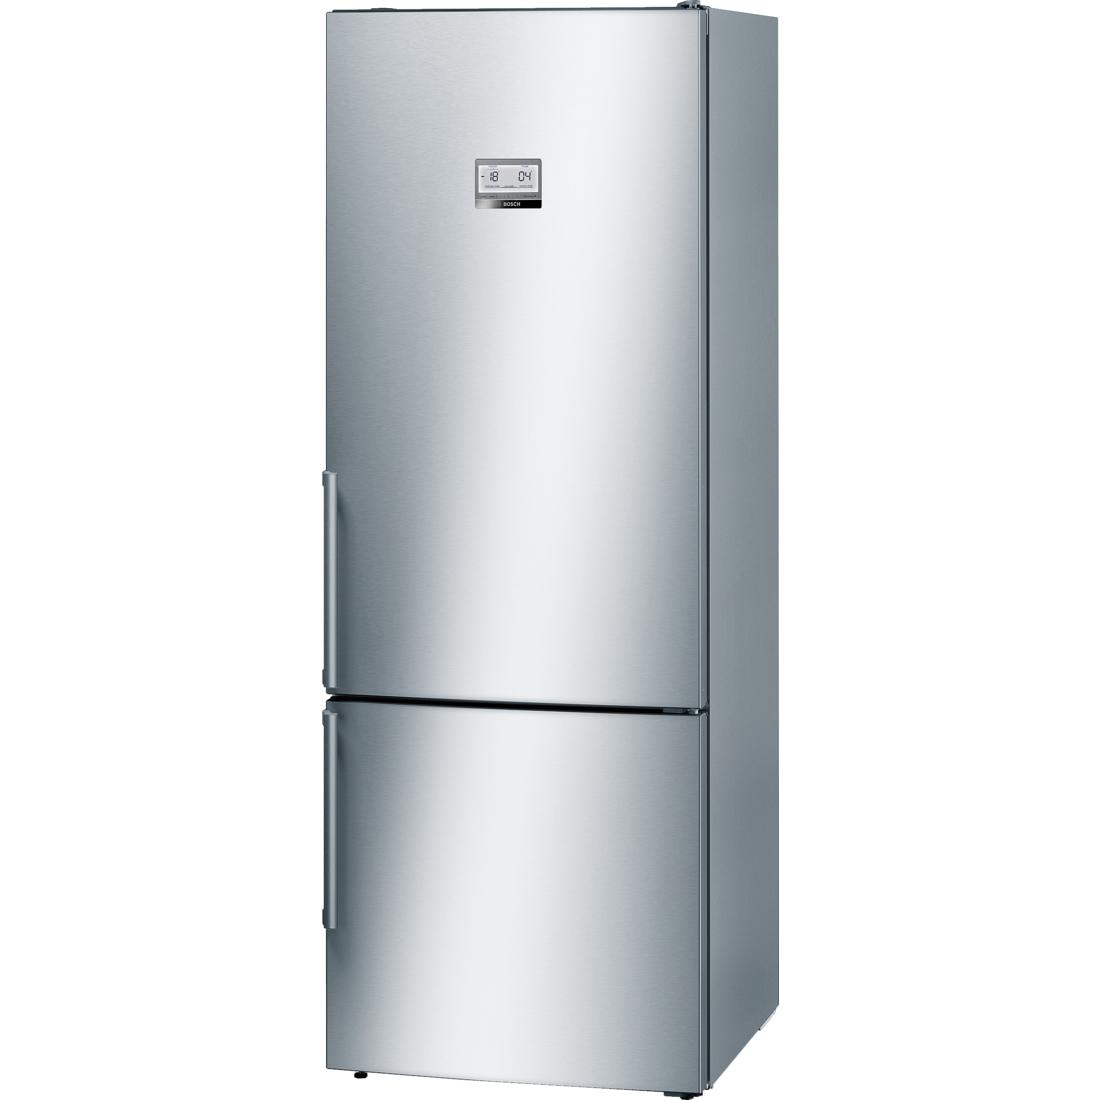 Imagine indisponibila pentru Combina frigorifica Bosch KGN56AI30 NoFrost clasa A++ 505 litri afişaj LCD VitaFresh plus inox easyClean